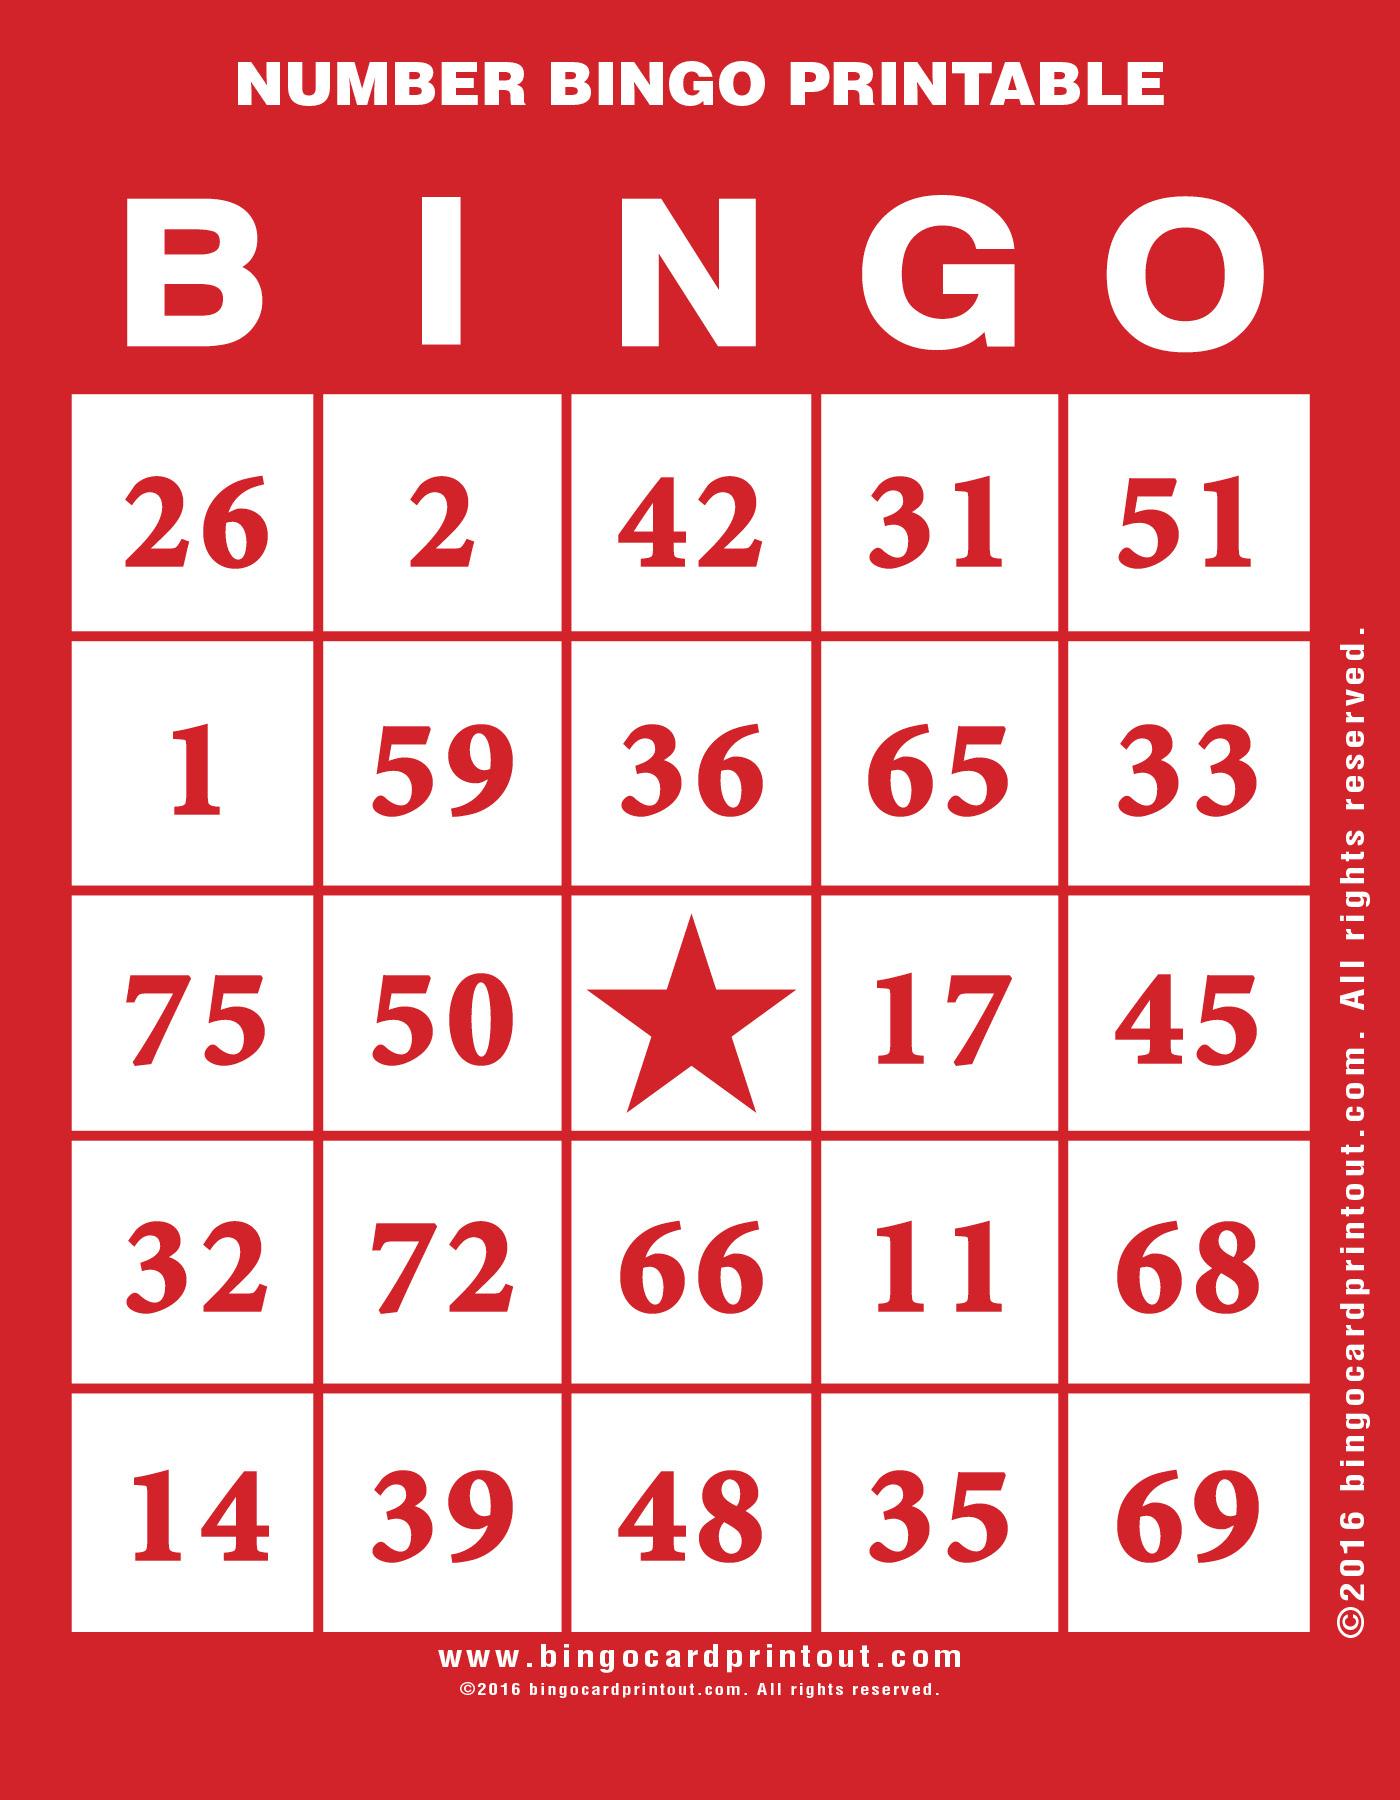 Number Bingo Printable - Bingocardprintout